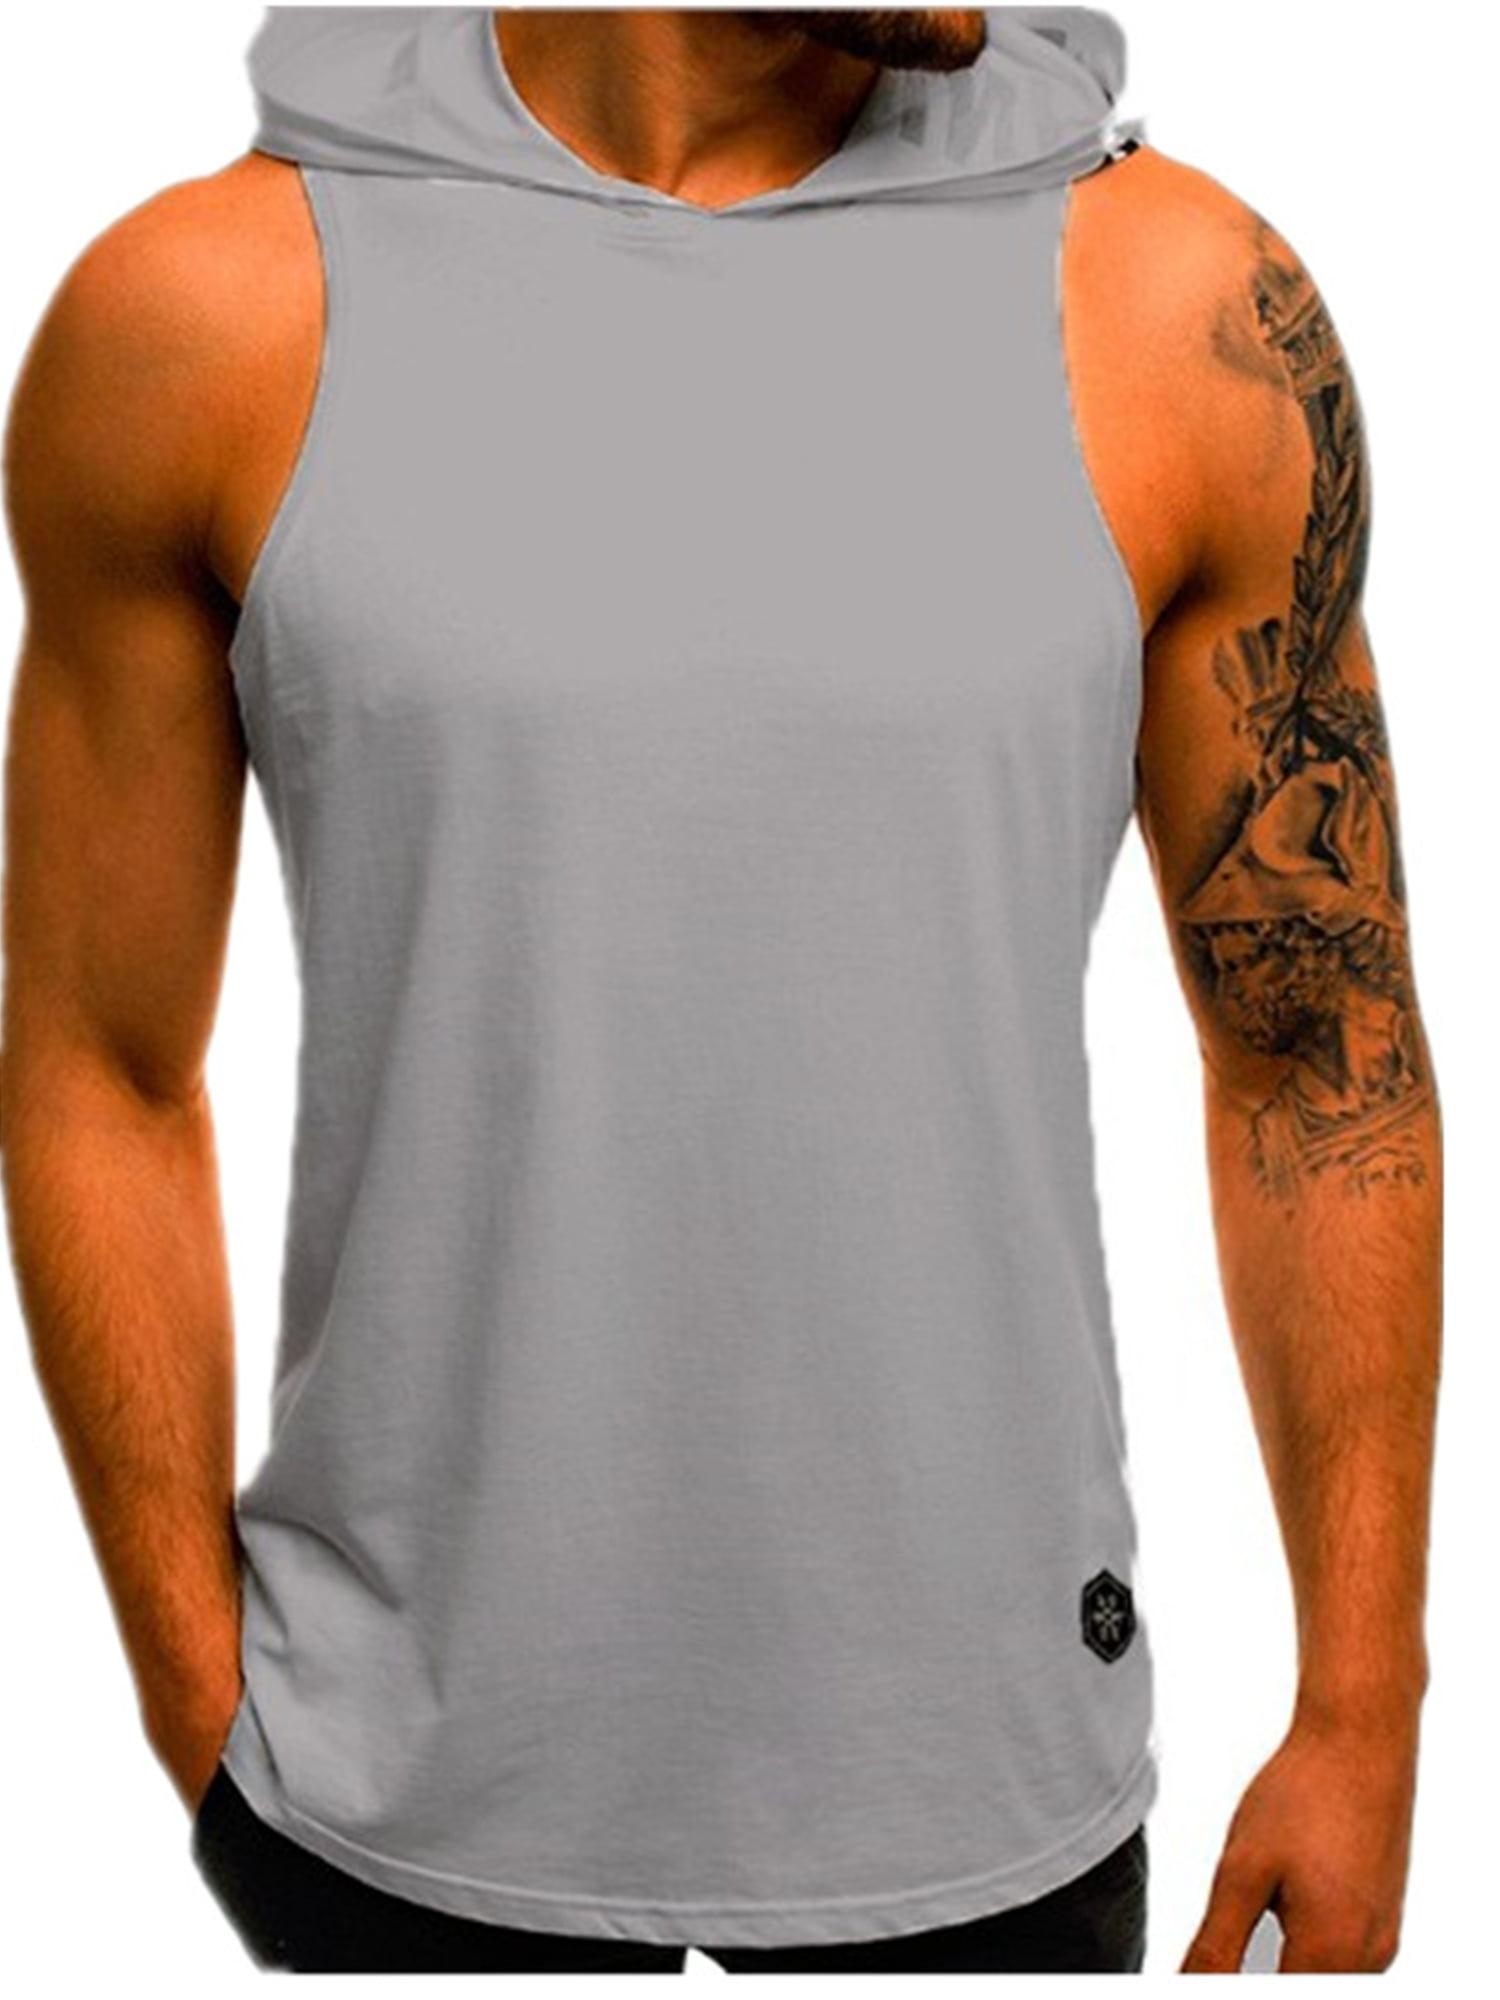 Men Sport Muscle Hoodie Tank Vest Top Sleeveless T-Shirt Tee Gym Workout Fitness